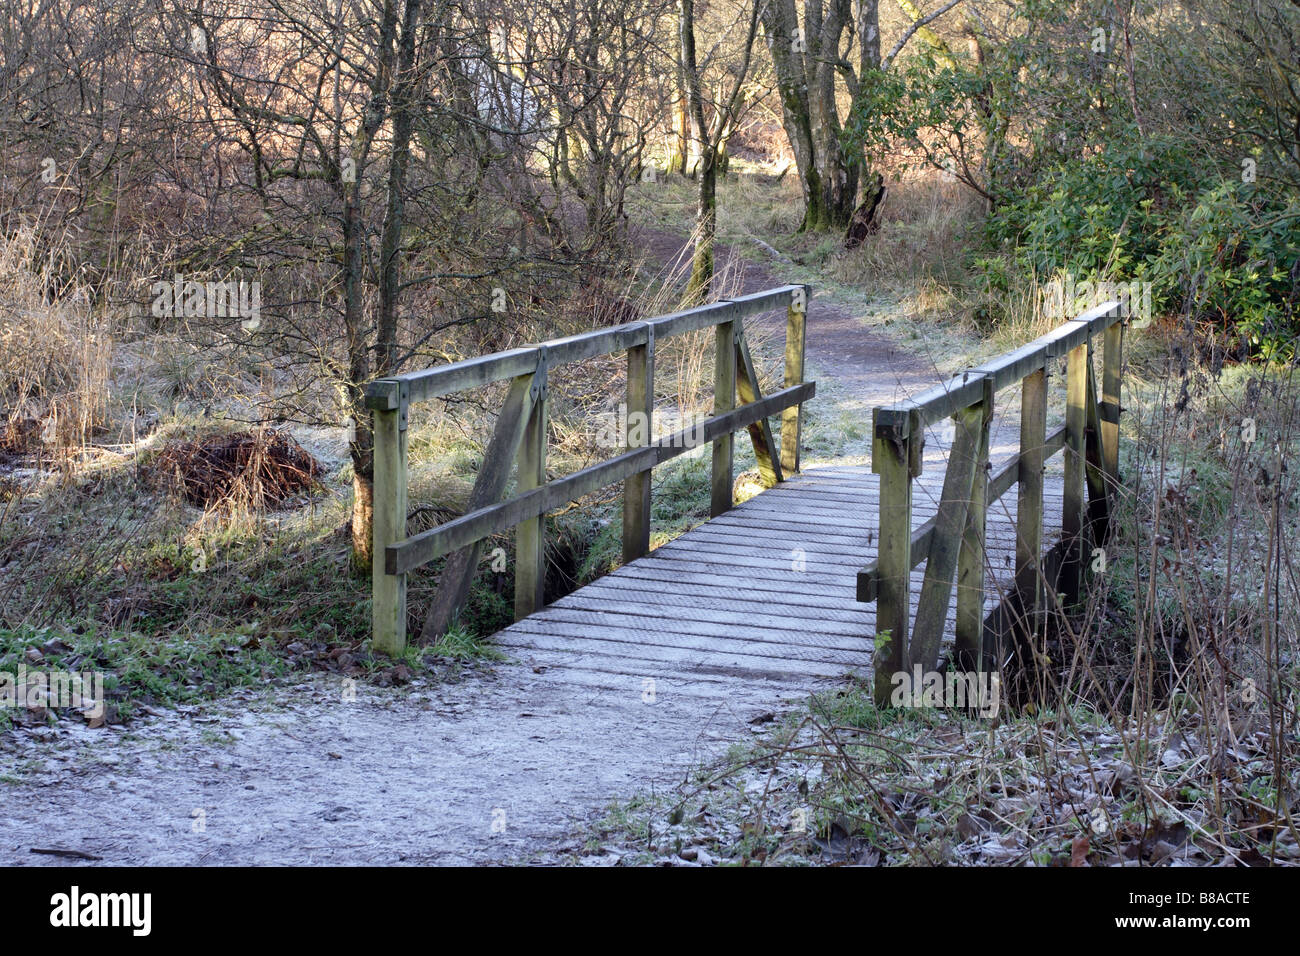 Semple Trail path over a frosty wooden footbridge in winter, Parkhill Woods, Clyde Muirshiel Regional Park, Lochwinnoch, Renfrewshire, Scotland, UK Stock Photo